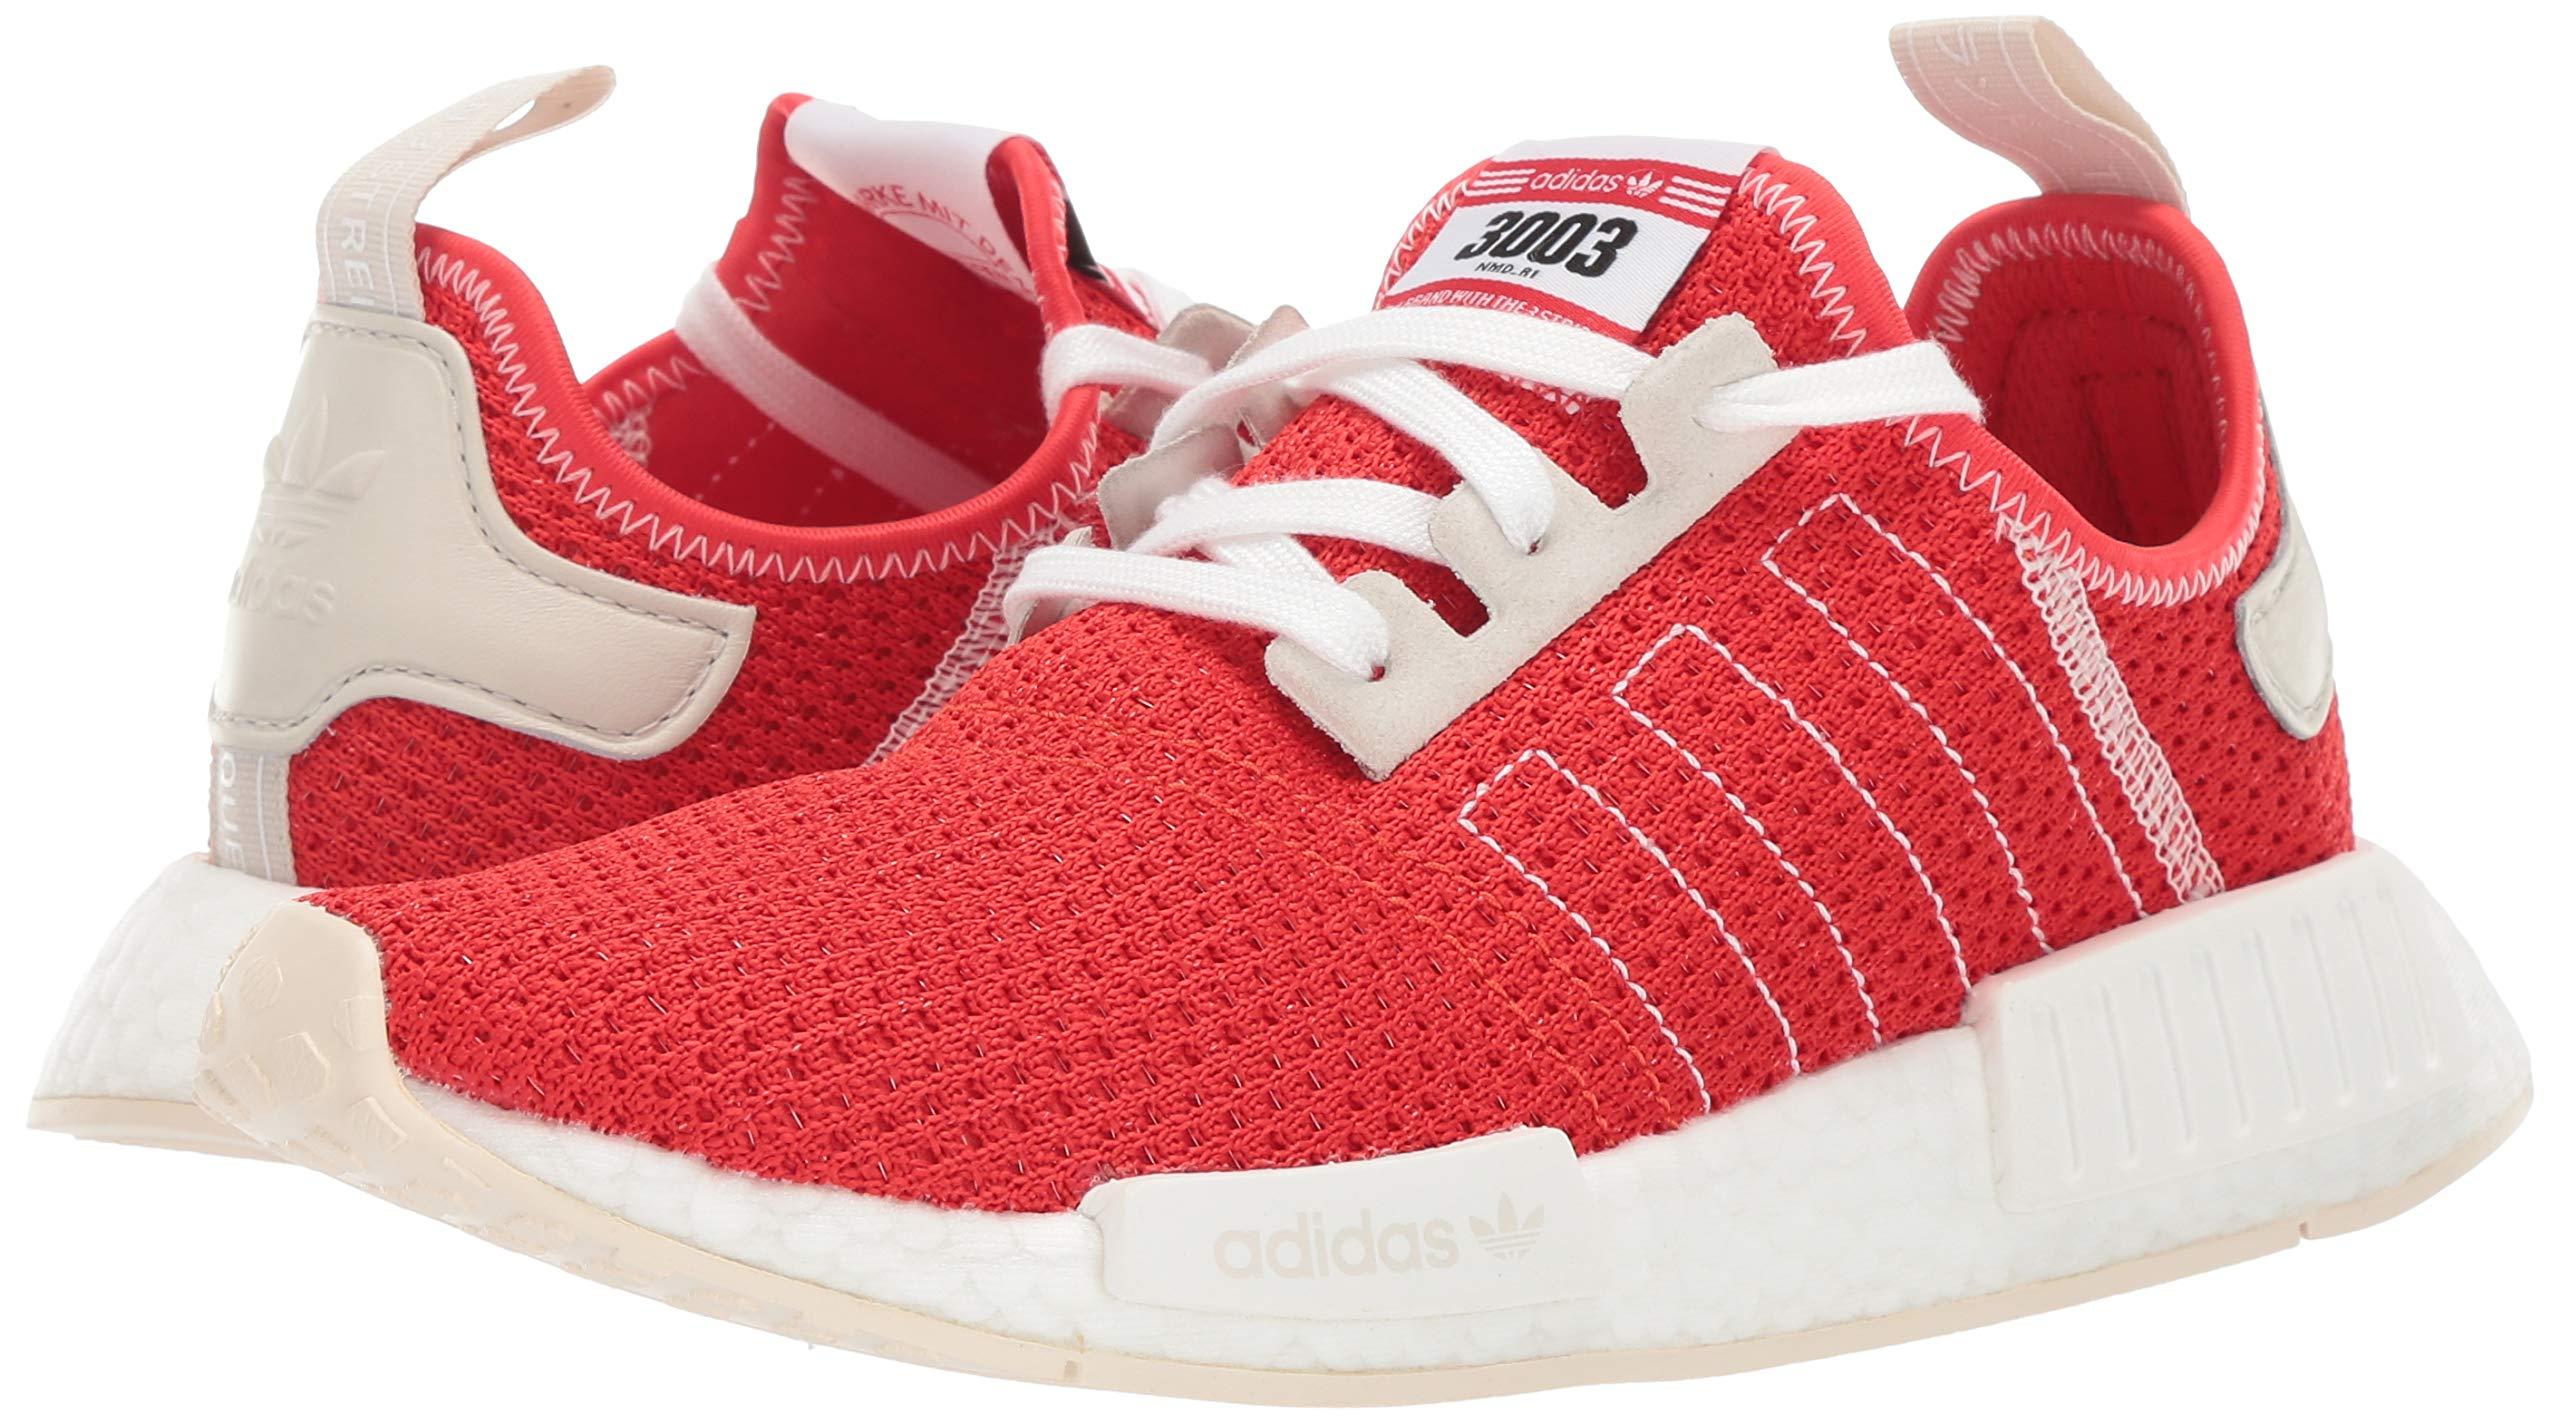 adidas Originals Men's NMD_R1 Running Shoe, Active red/Ecru Tint, 4 M US by adidas Originals (Image #6)